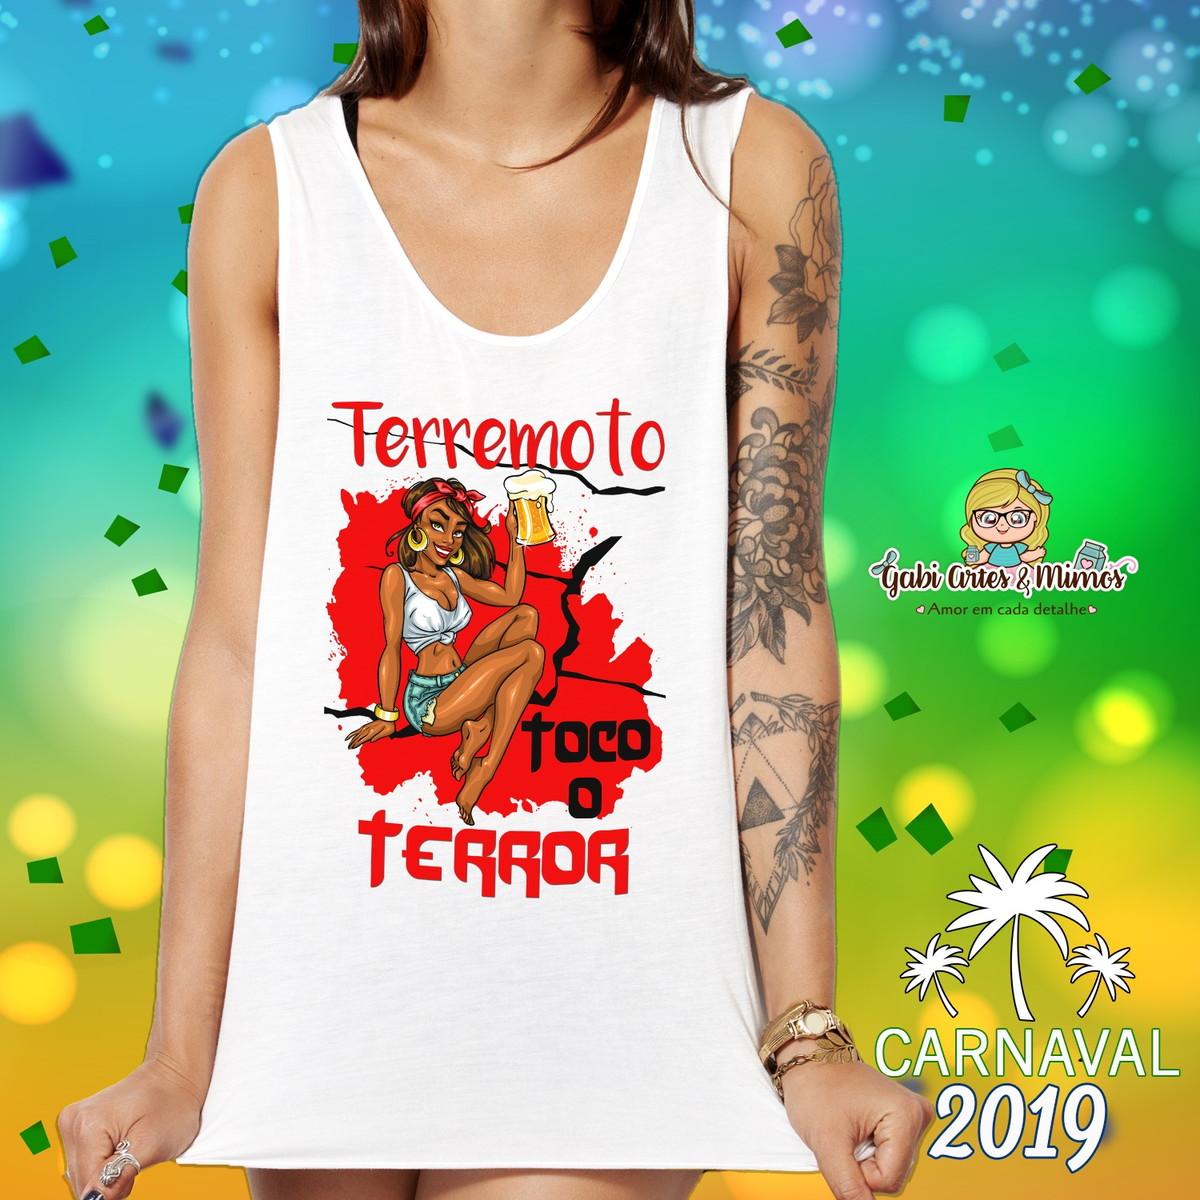 1ac581f555 Camiseta Regata Carnaval Terremoto Toco o Terror no Elo7